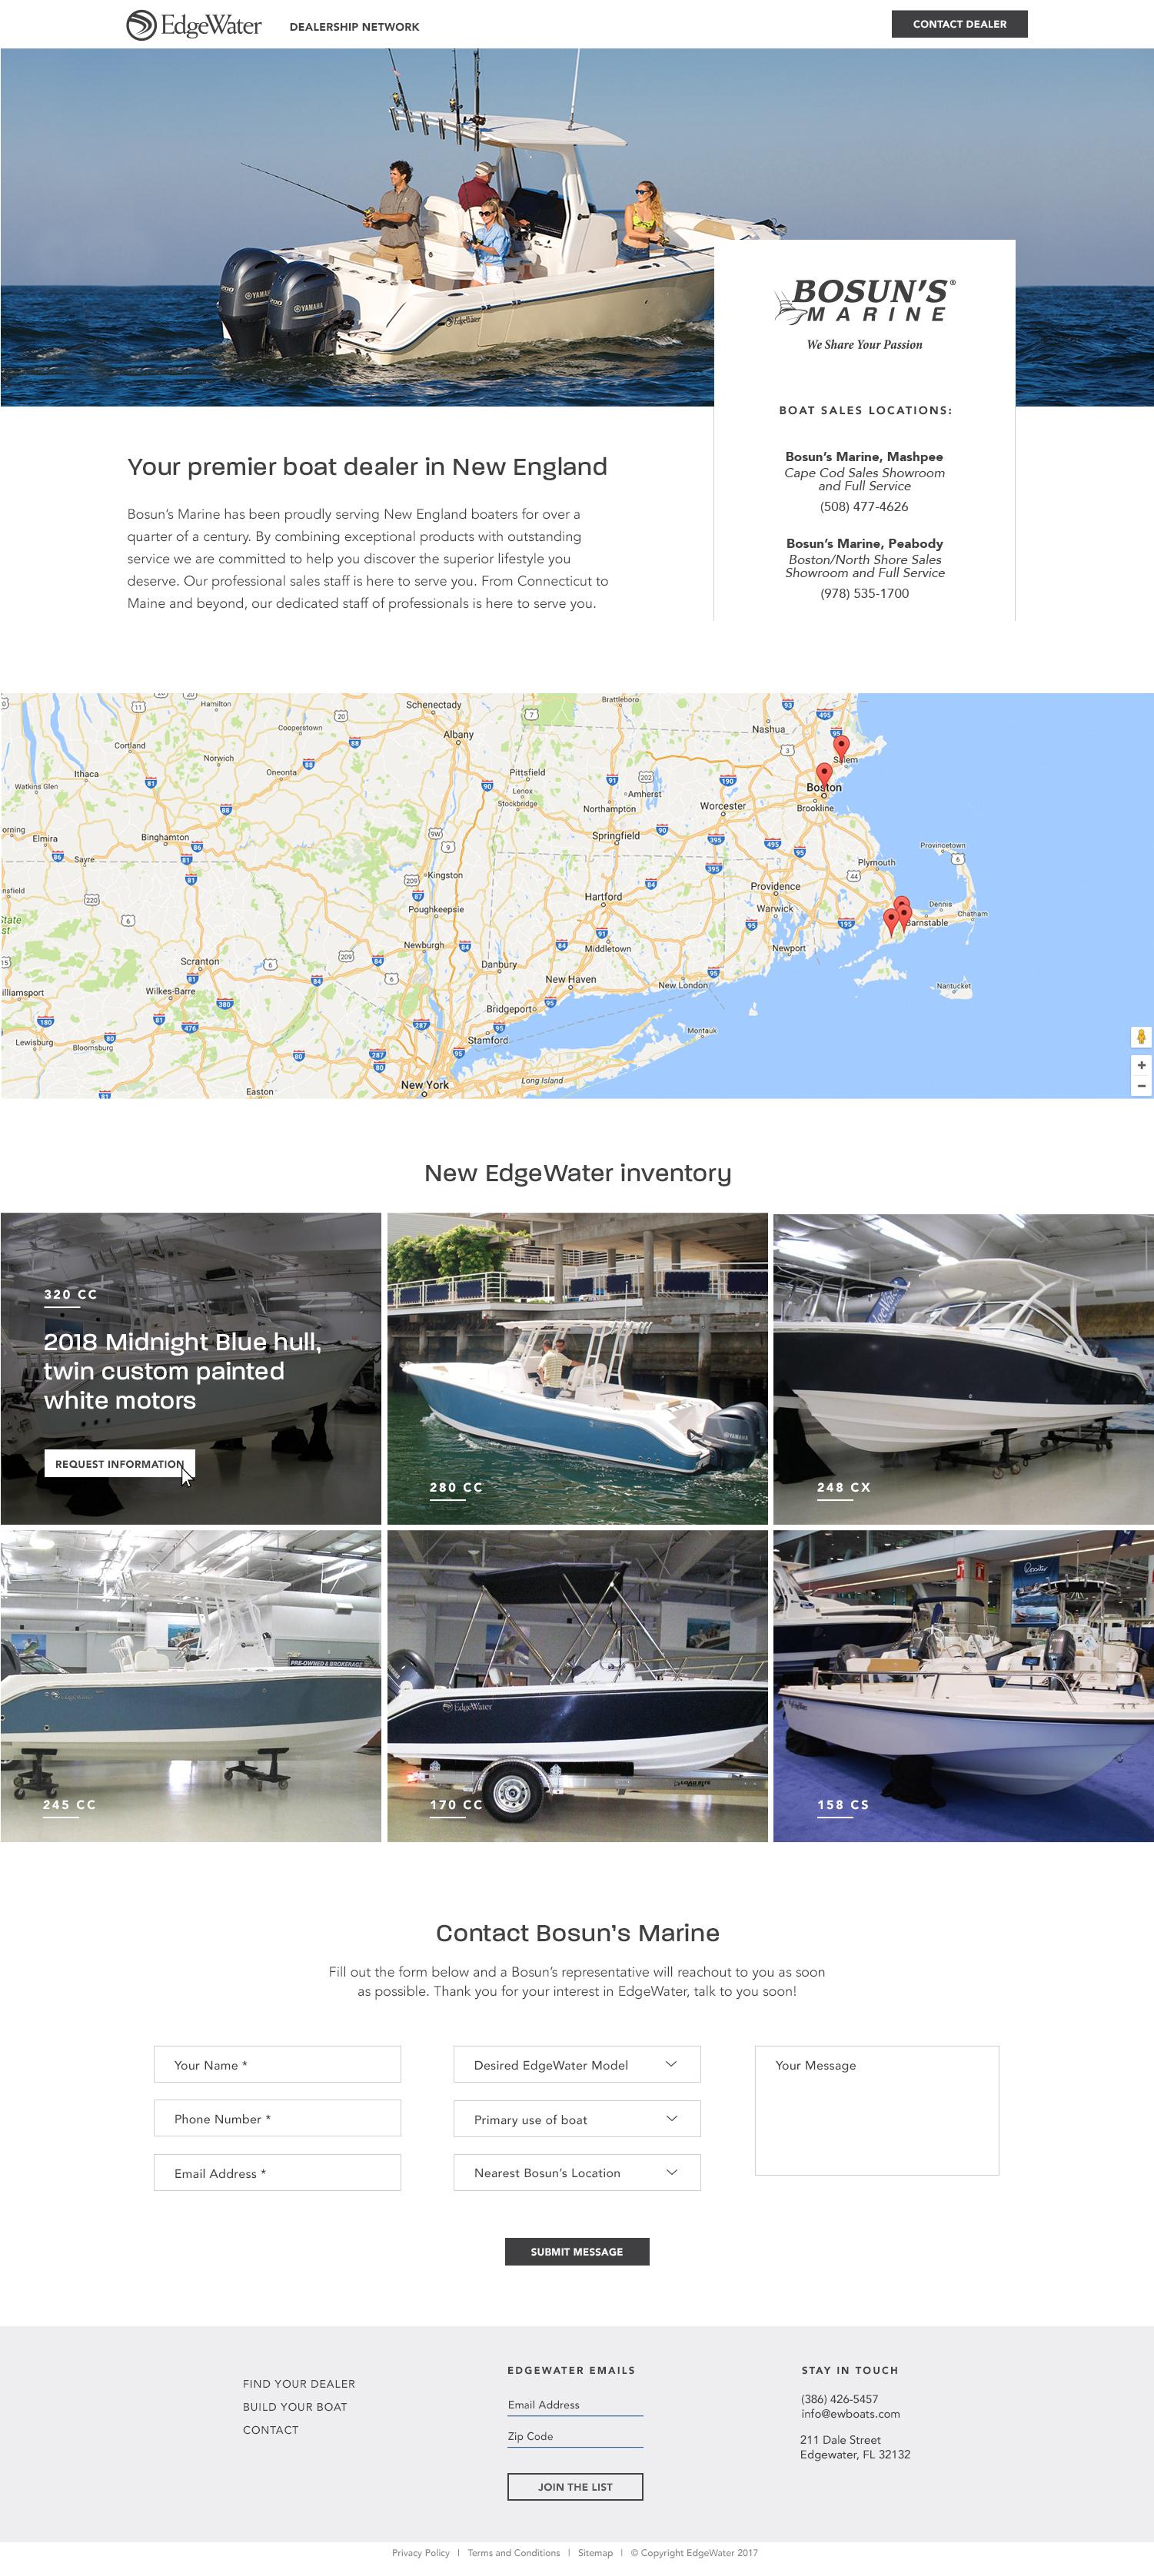 Dealer-LandingPage-EdgeWater.jpg